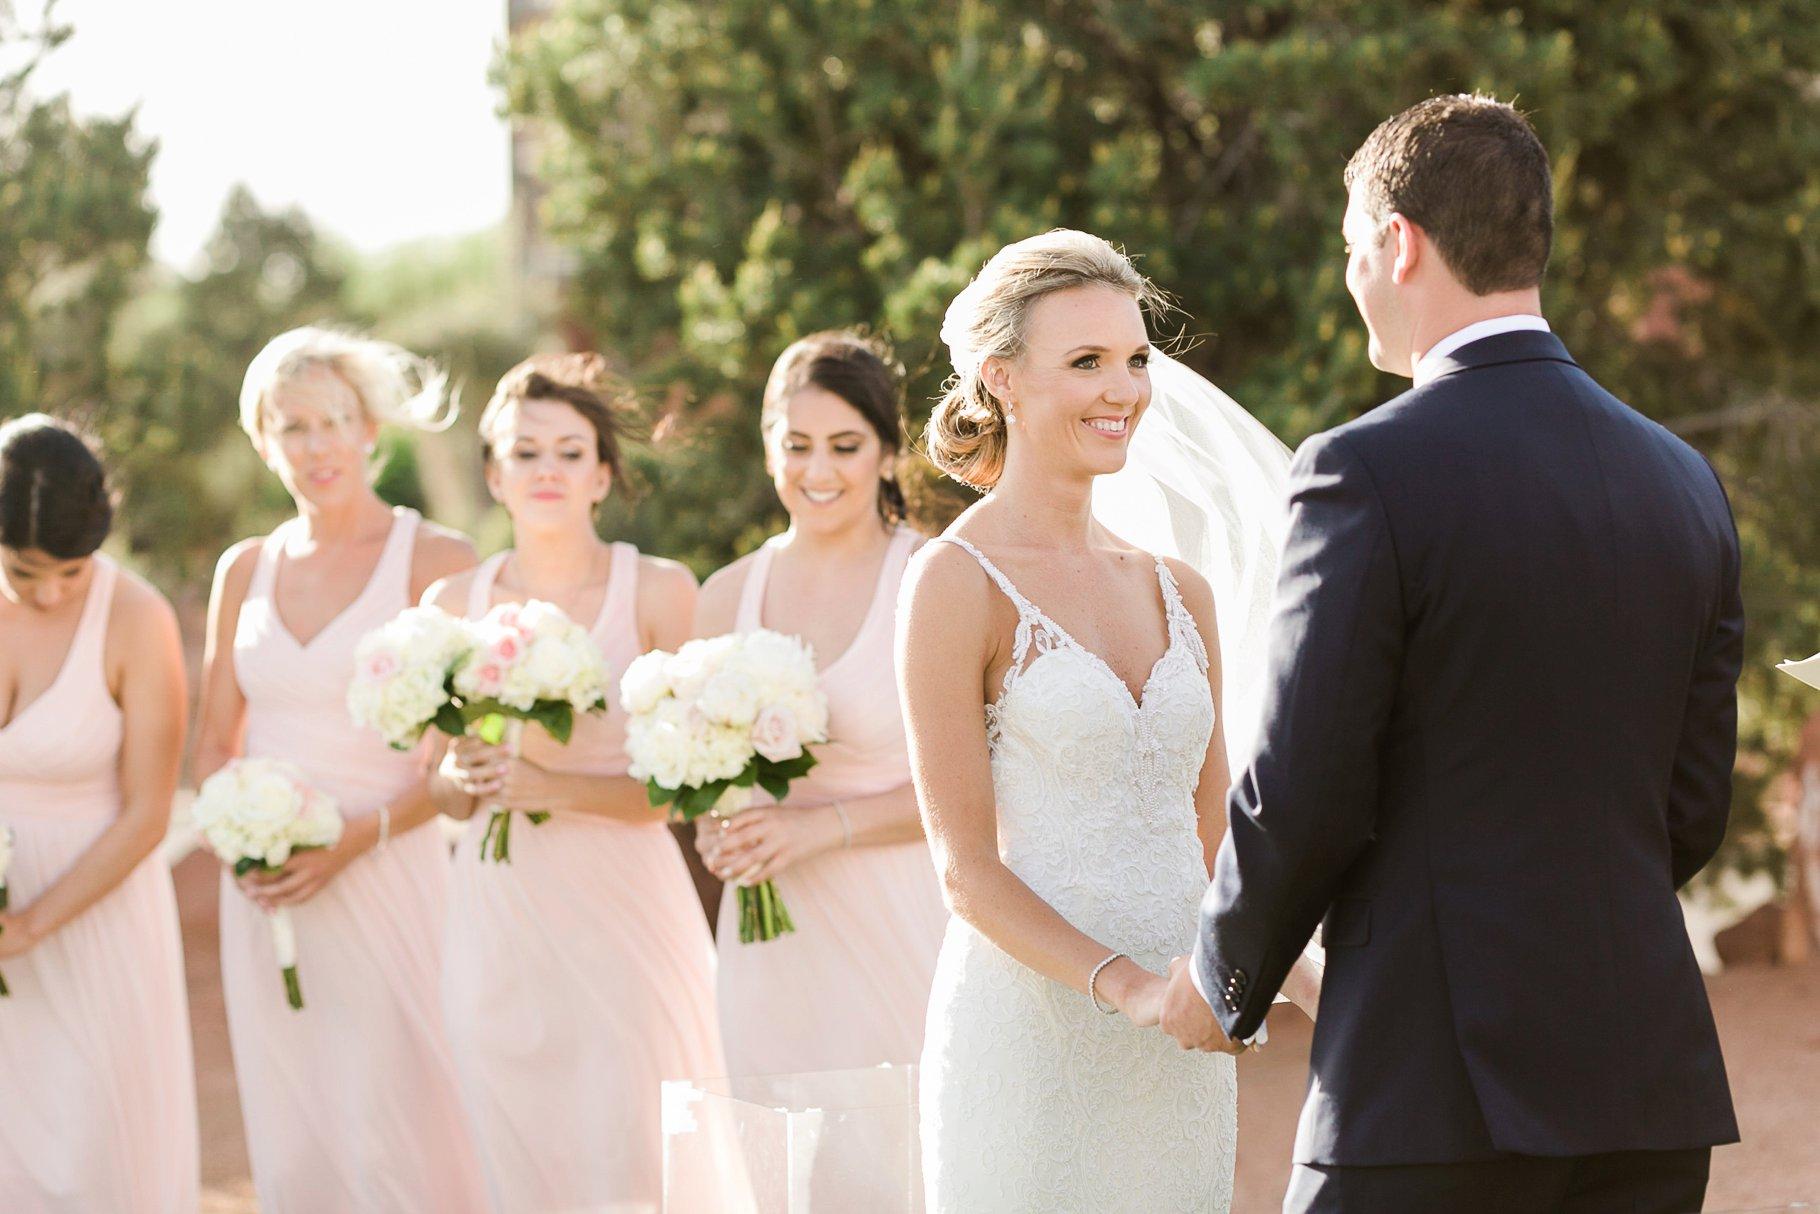 sedona wedding-77_GRETCHEN WAKEMAN PHOTOGRAPHY.jpg